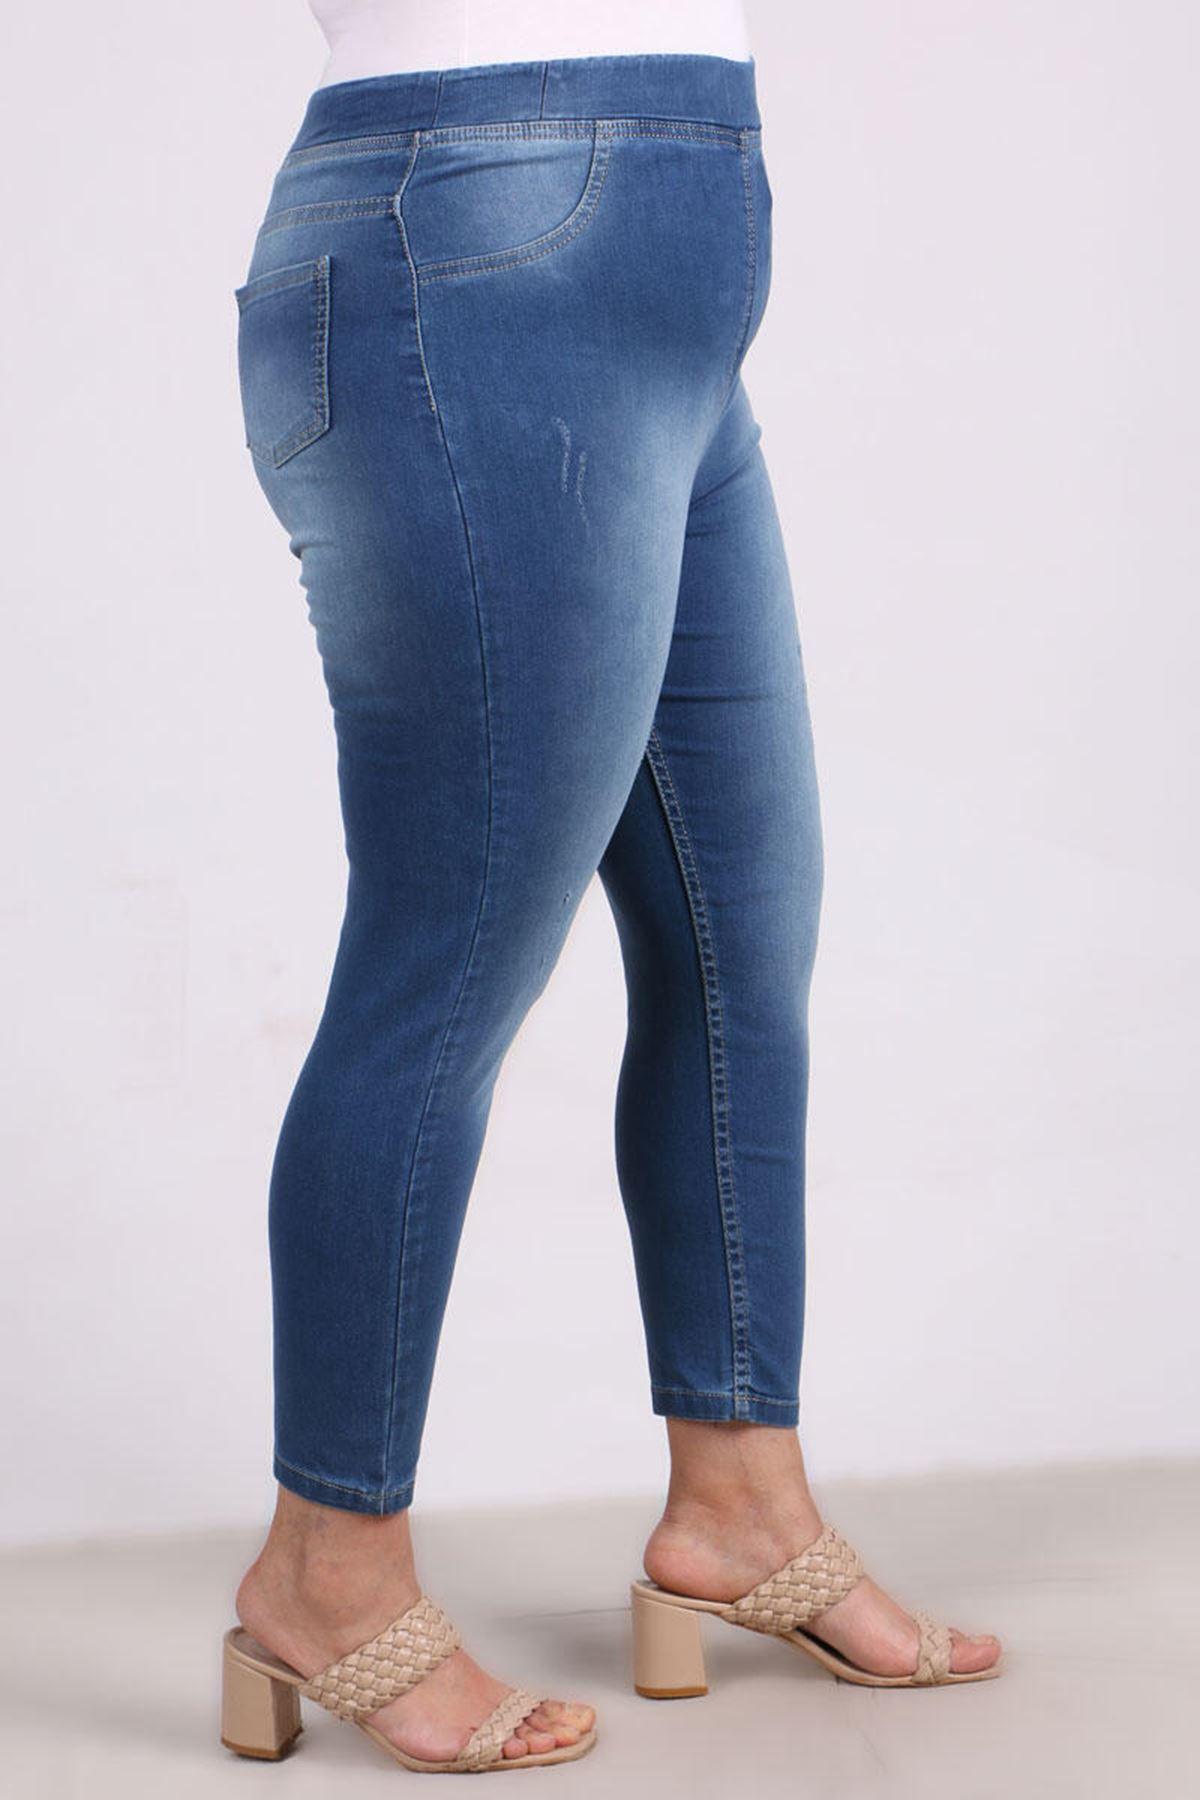 9109-10 Plus Size Elastic Waist Skinny Leg Jeans - Light  Blue